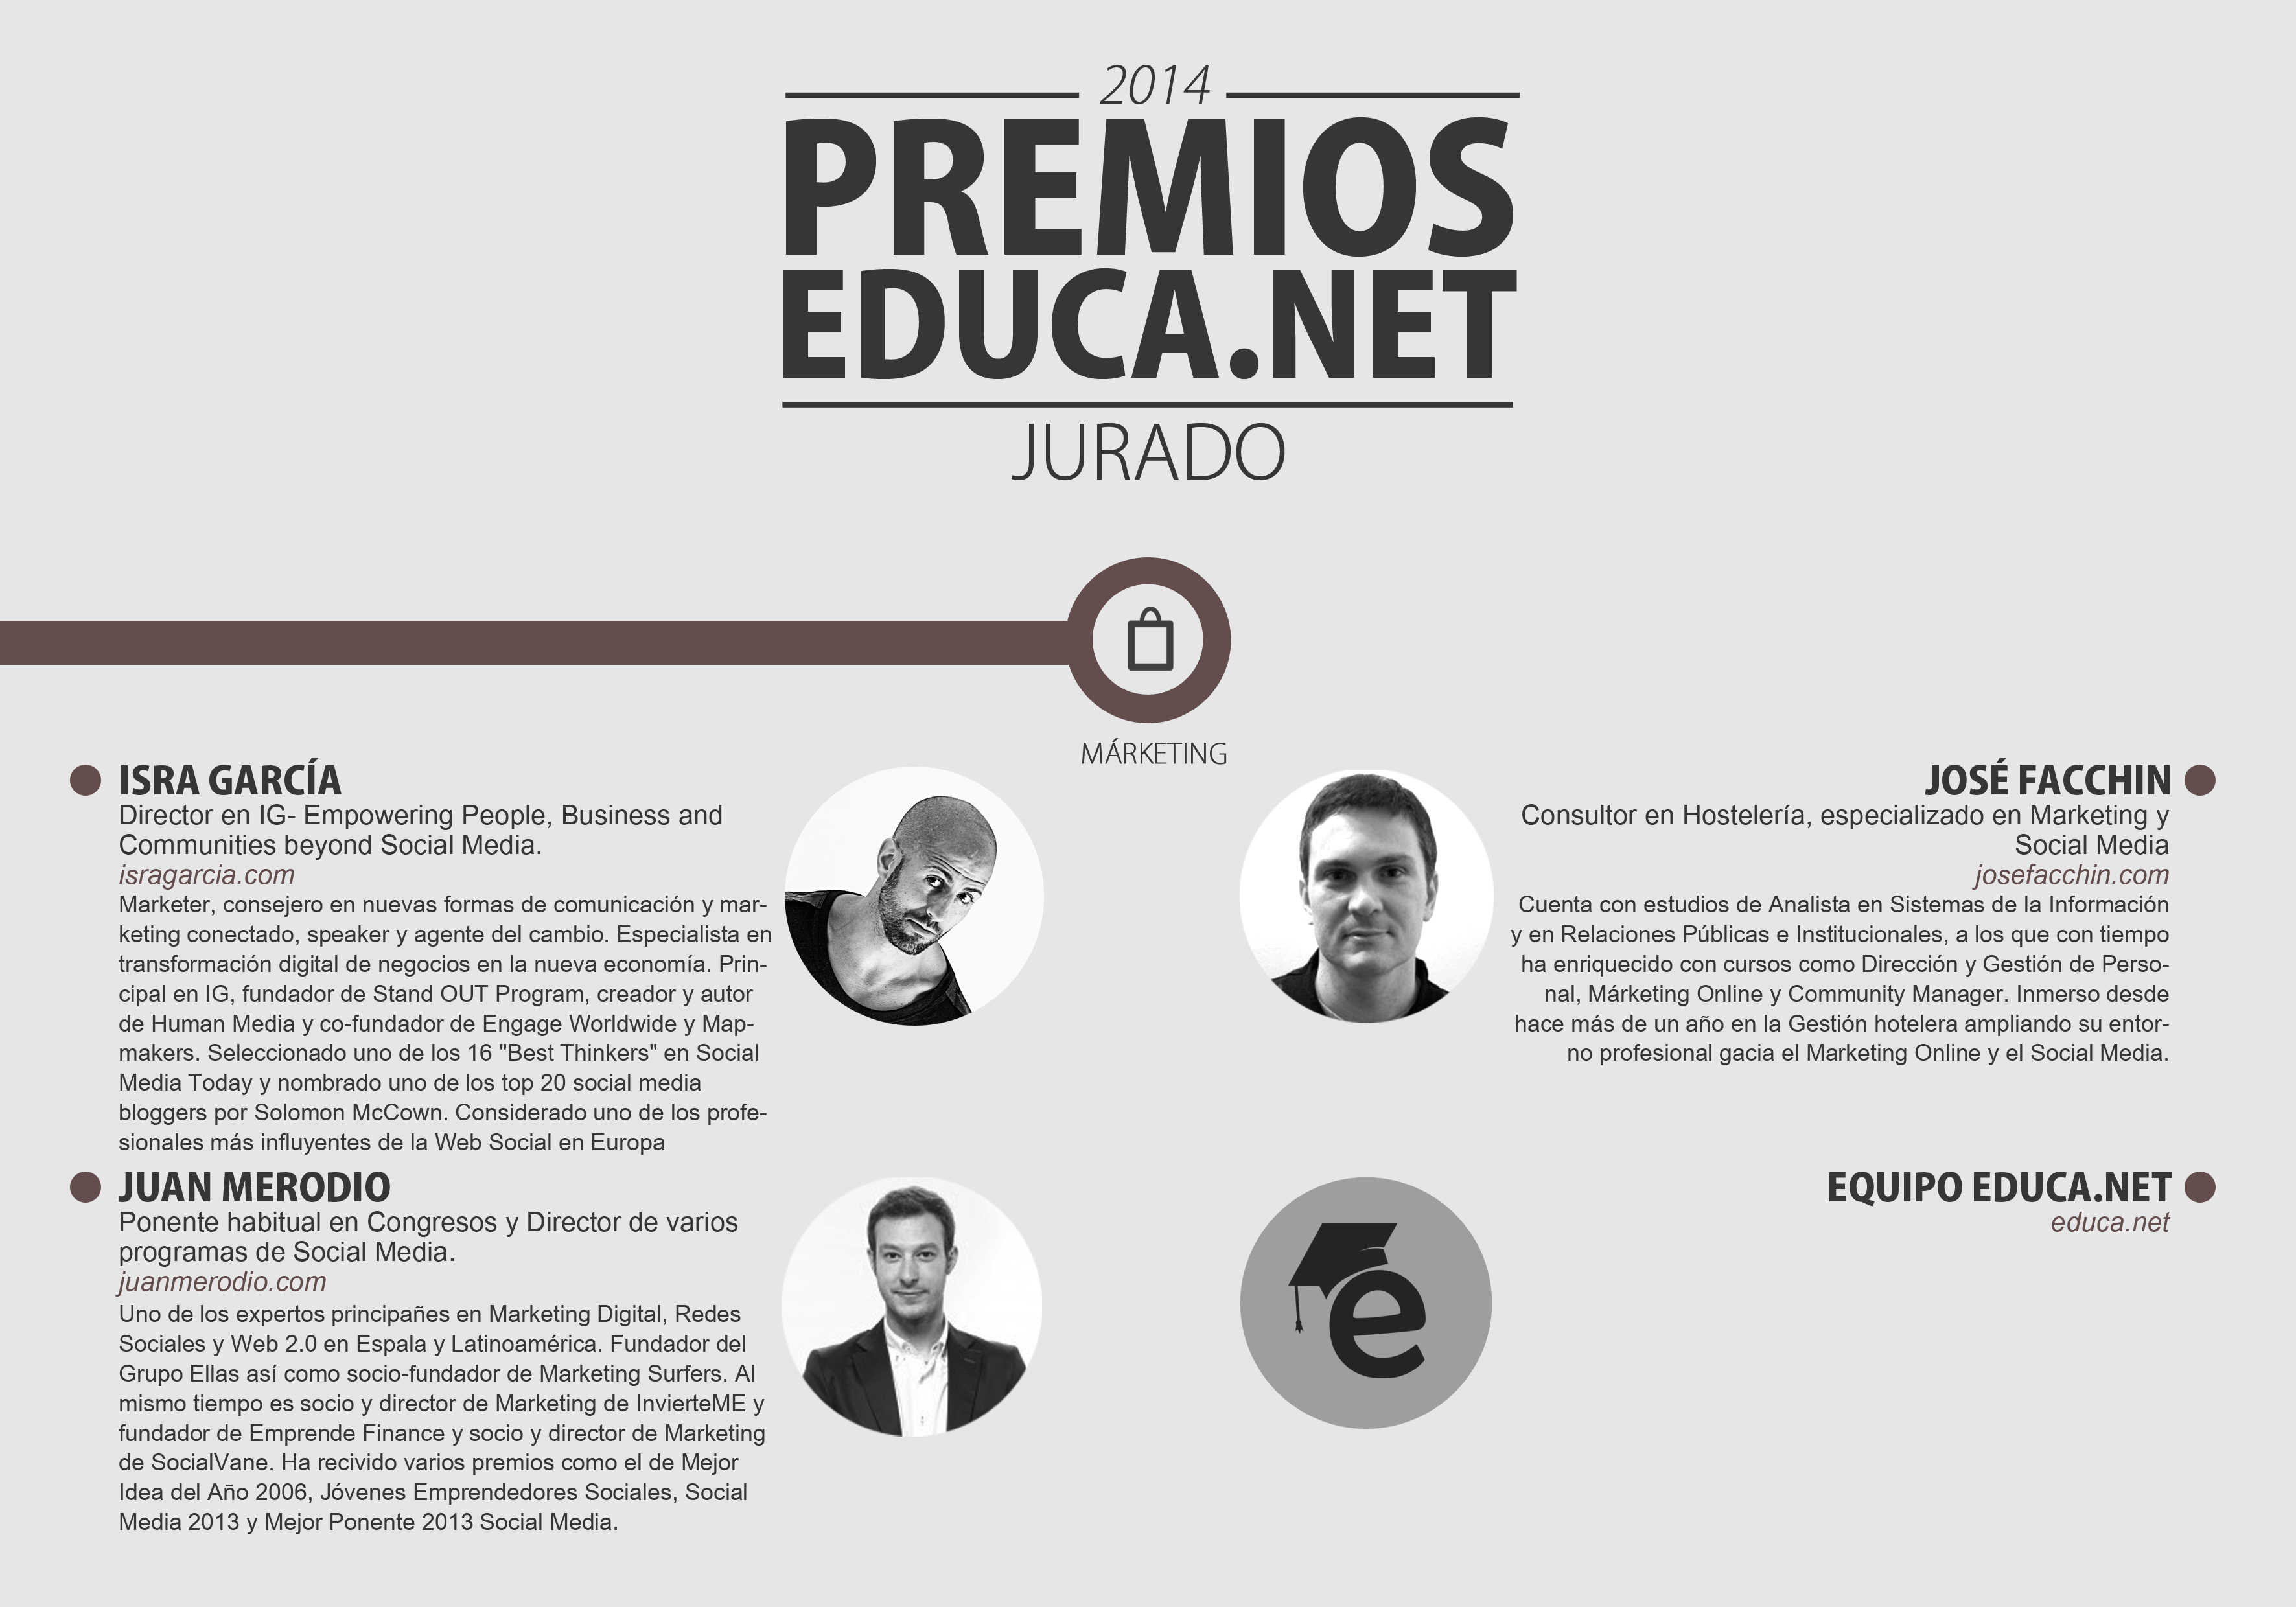 Jurado Marketing Premios Educa.net